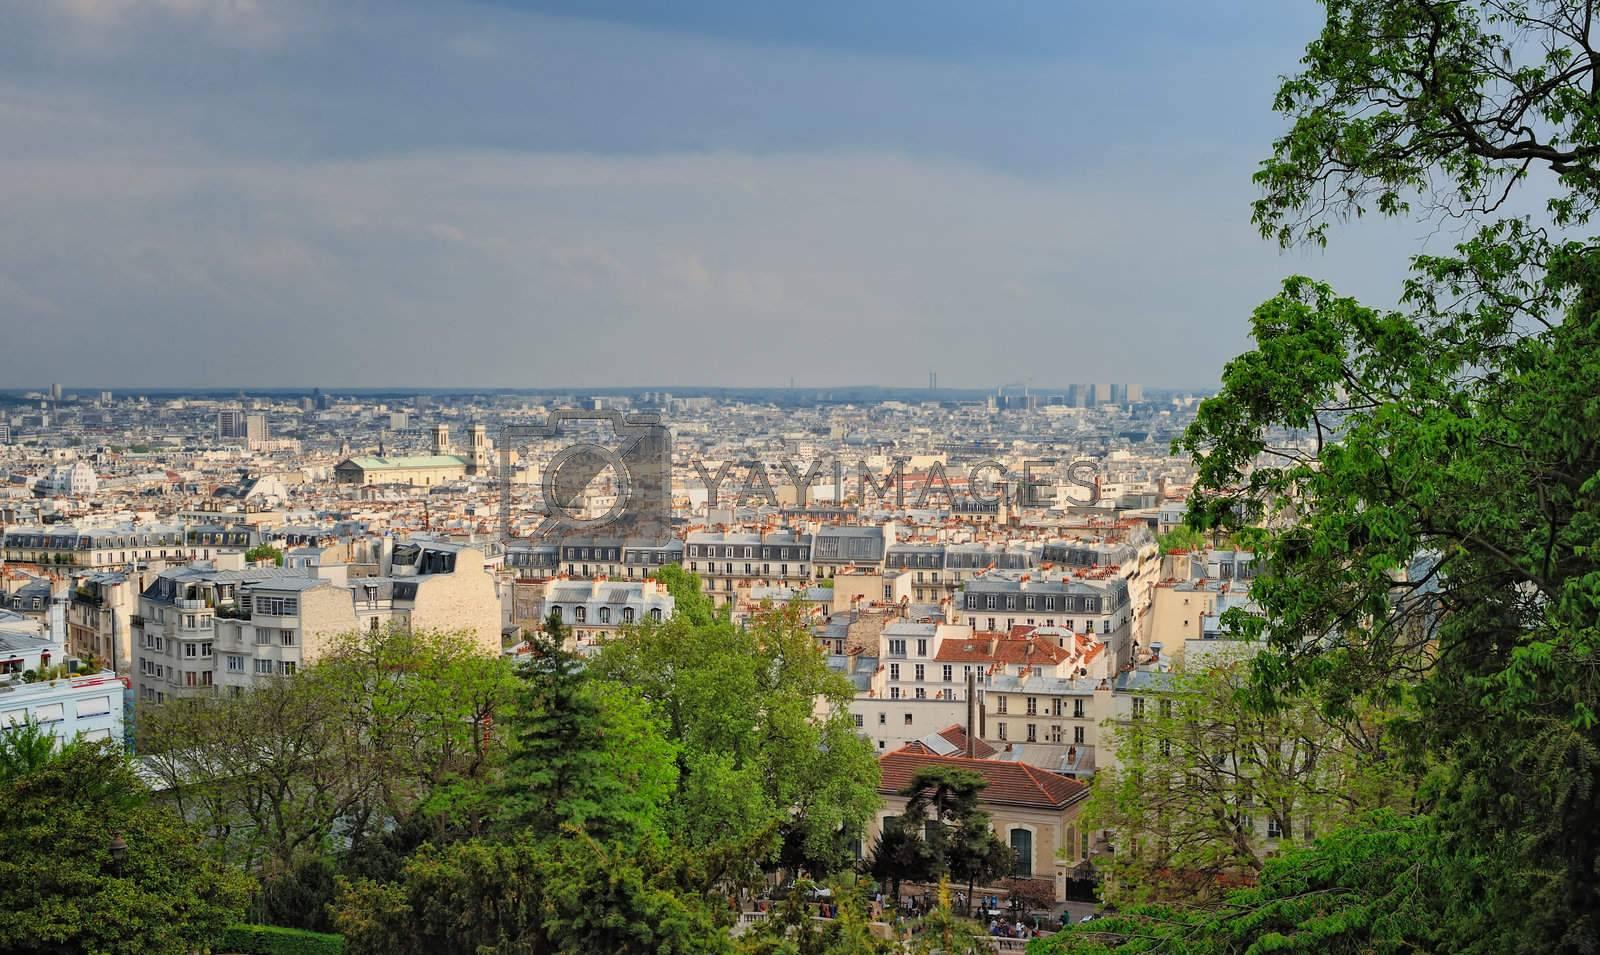 Royalty free image of Parisian cityscape by styf22